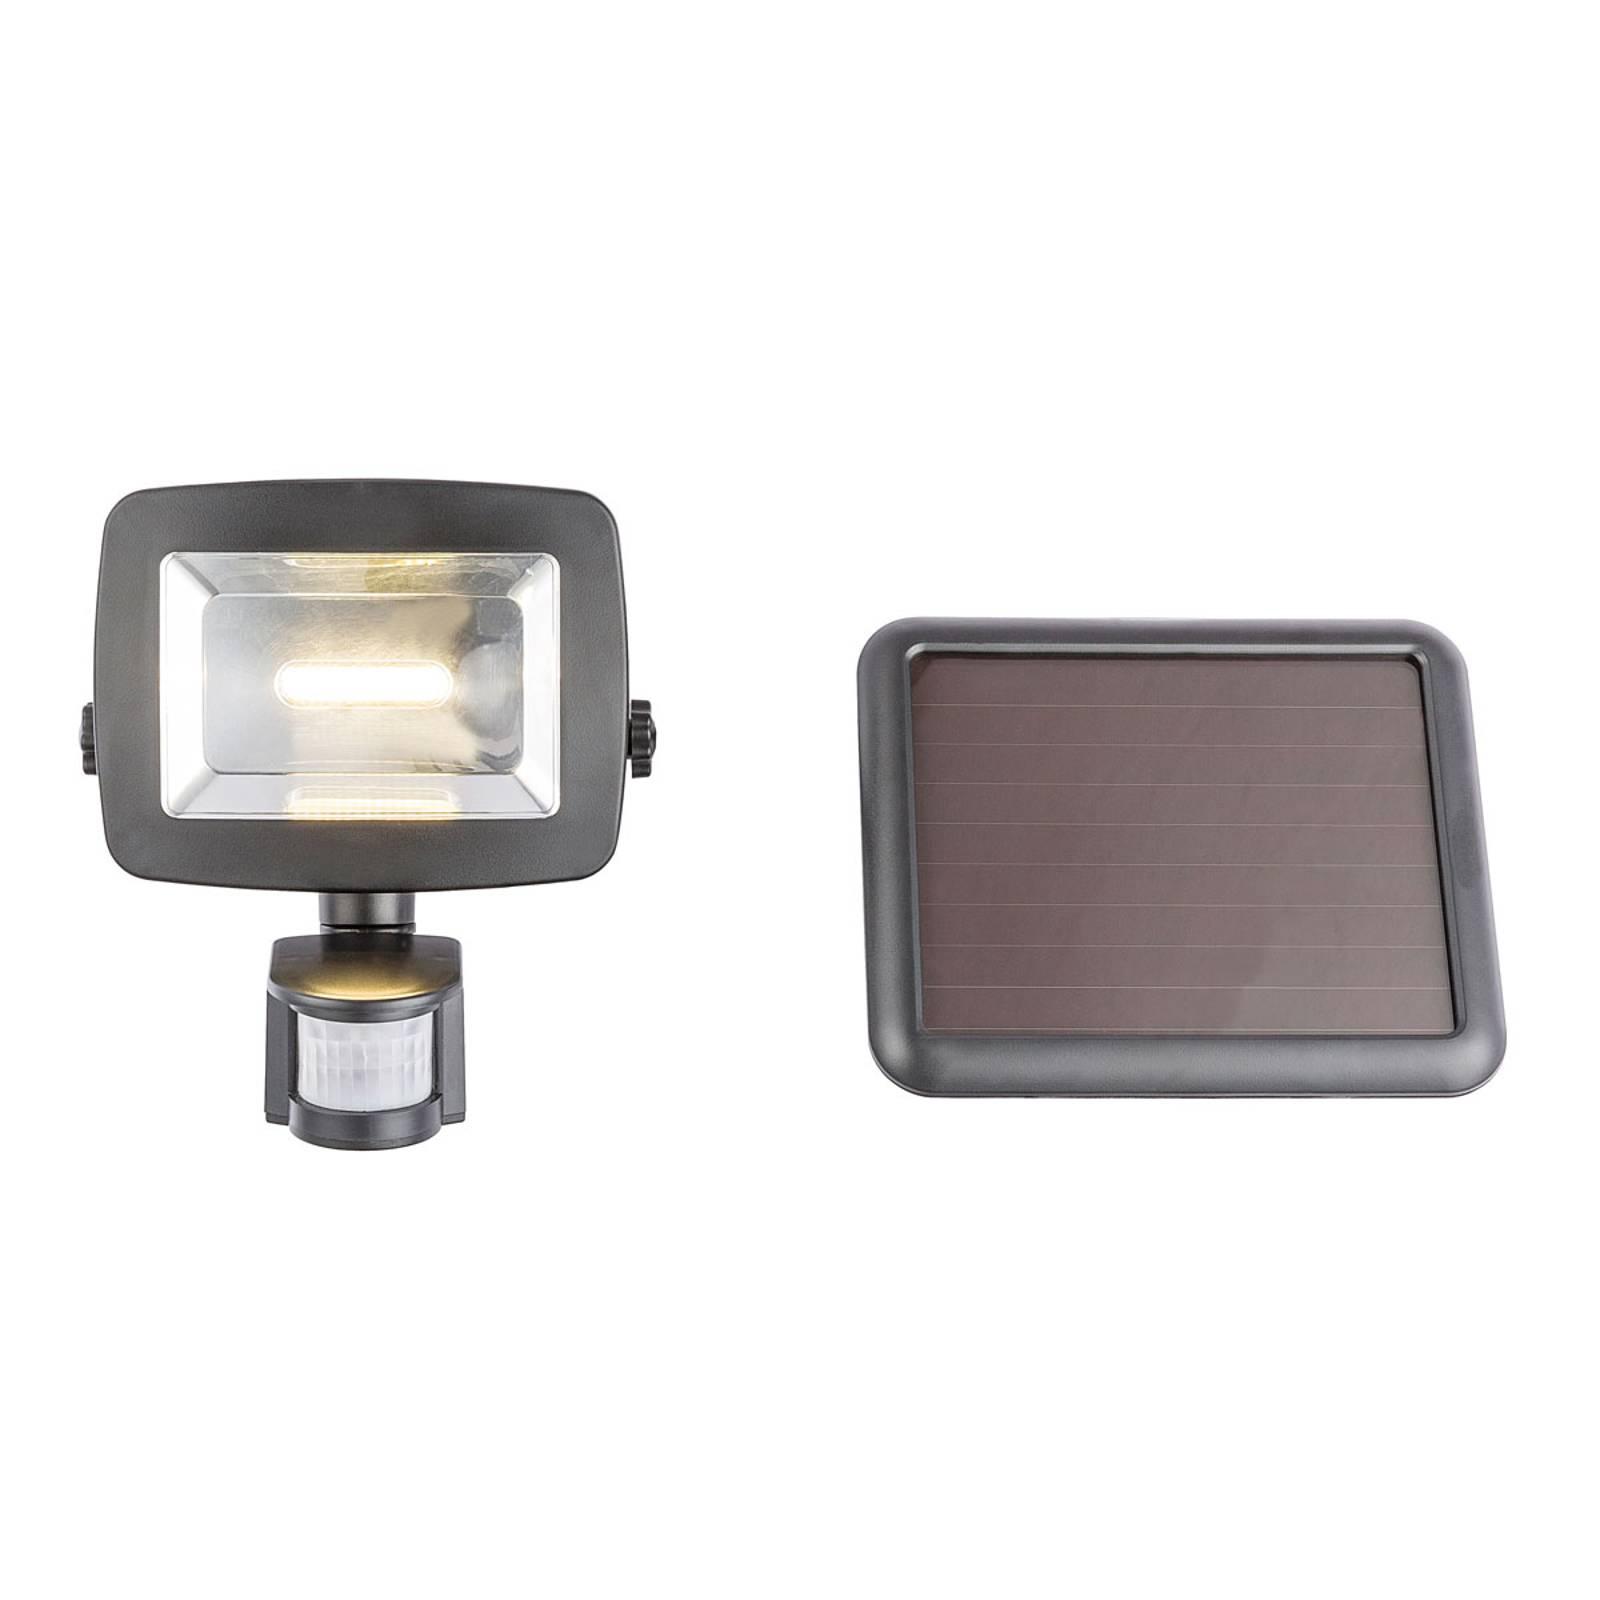 LED-Solar-Außenwandleuchte 37201S, Sensor, schwarz